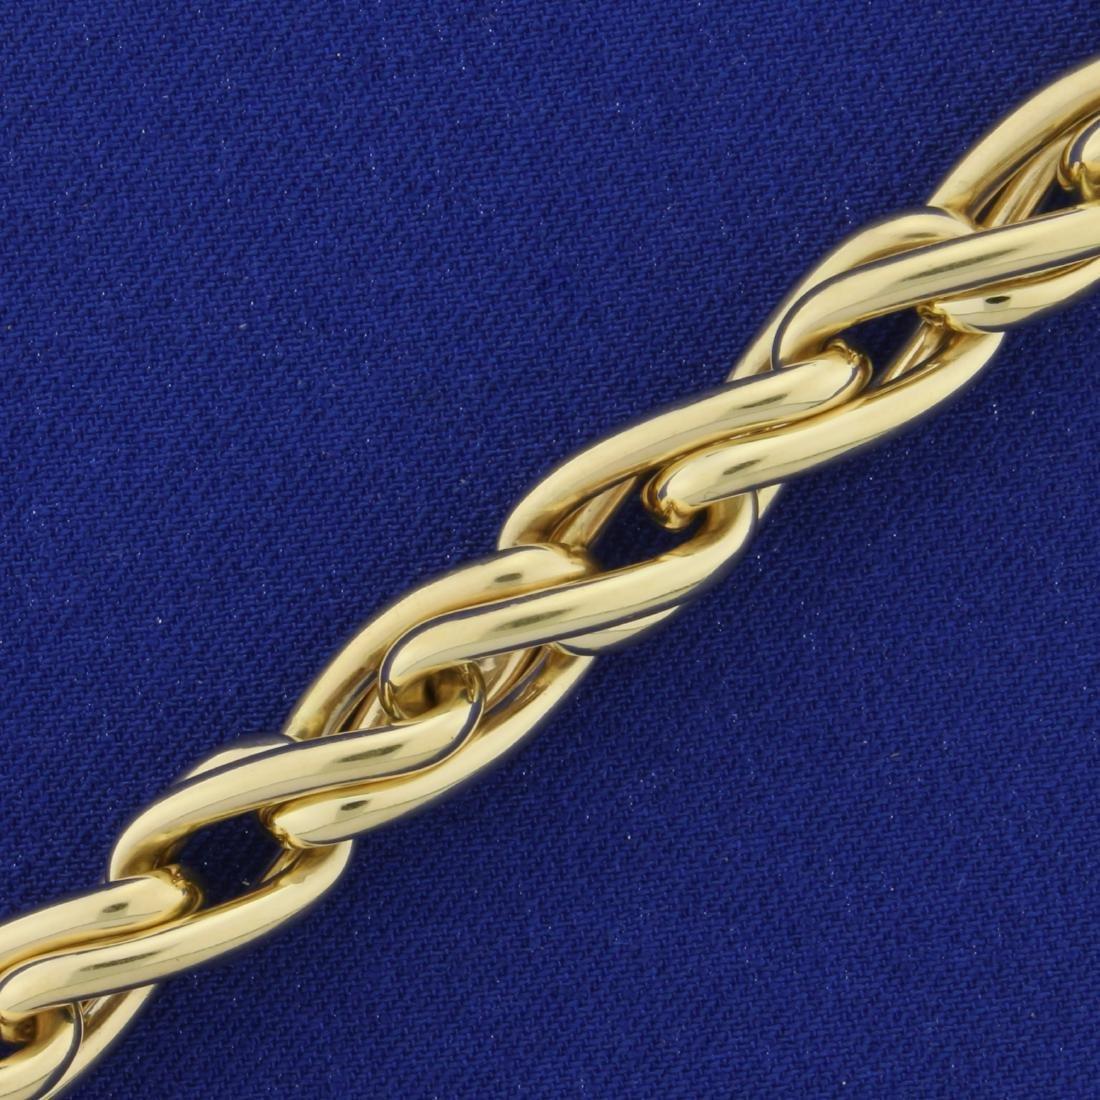 Heavy Italian Made Designer Twisting Link Bracelet in - 2